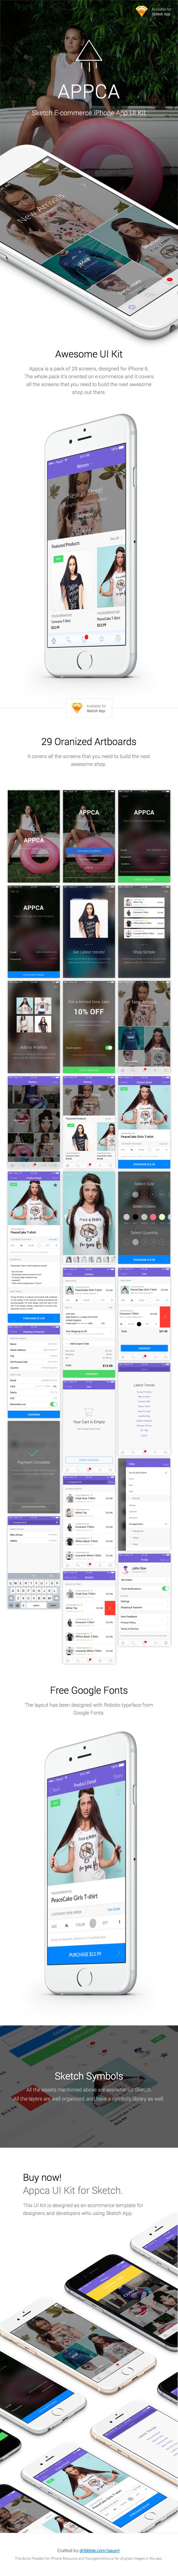 Appca - Ecommerce UI Kit for Sketch App - 1